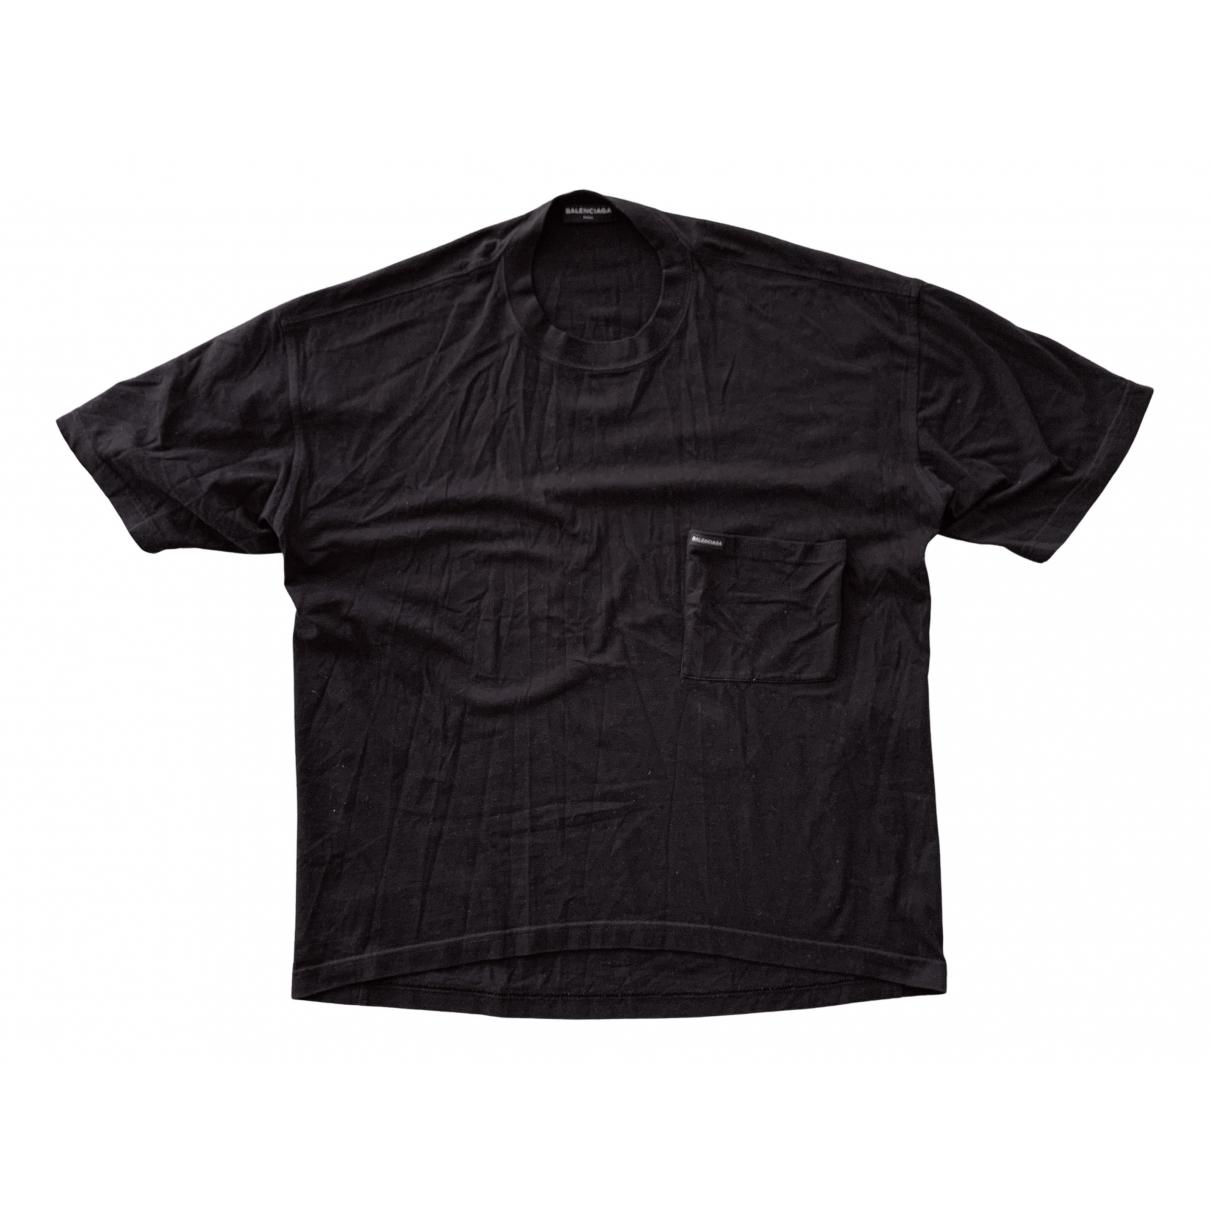 Balenciaga N Black Cotton  top for Women XS International